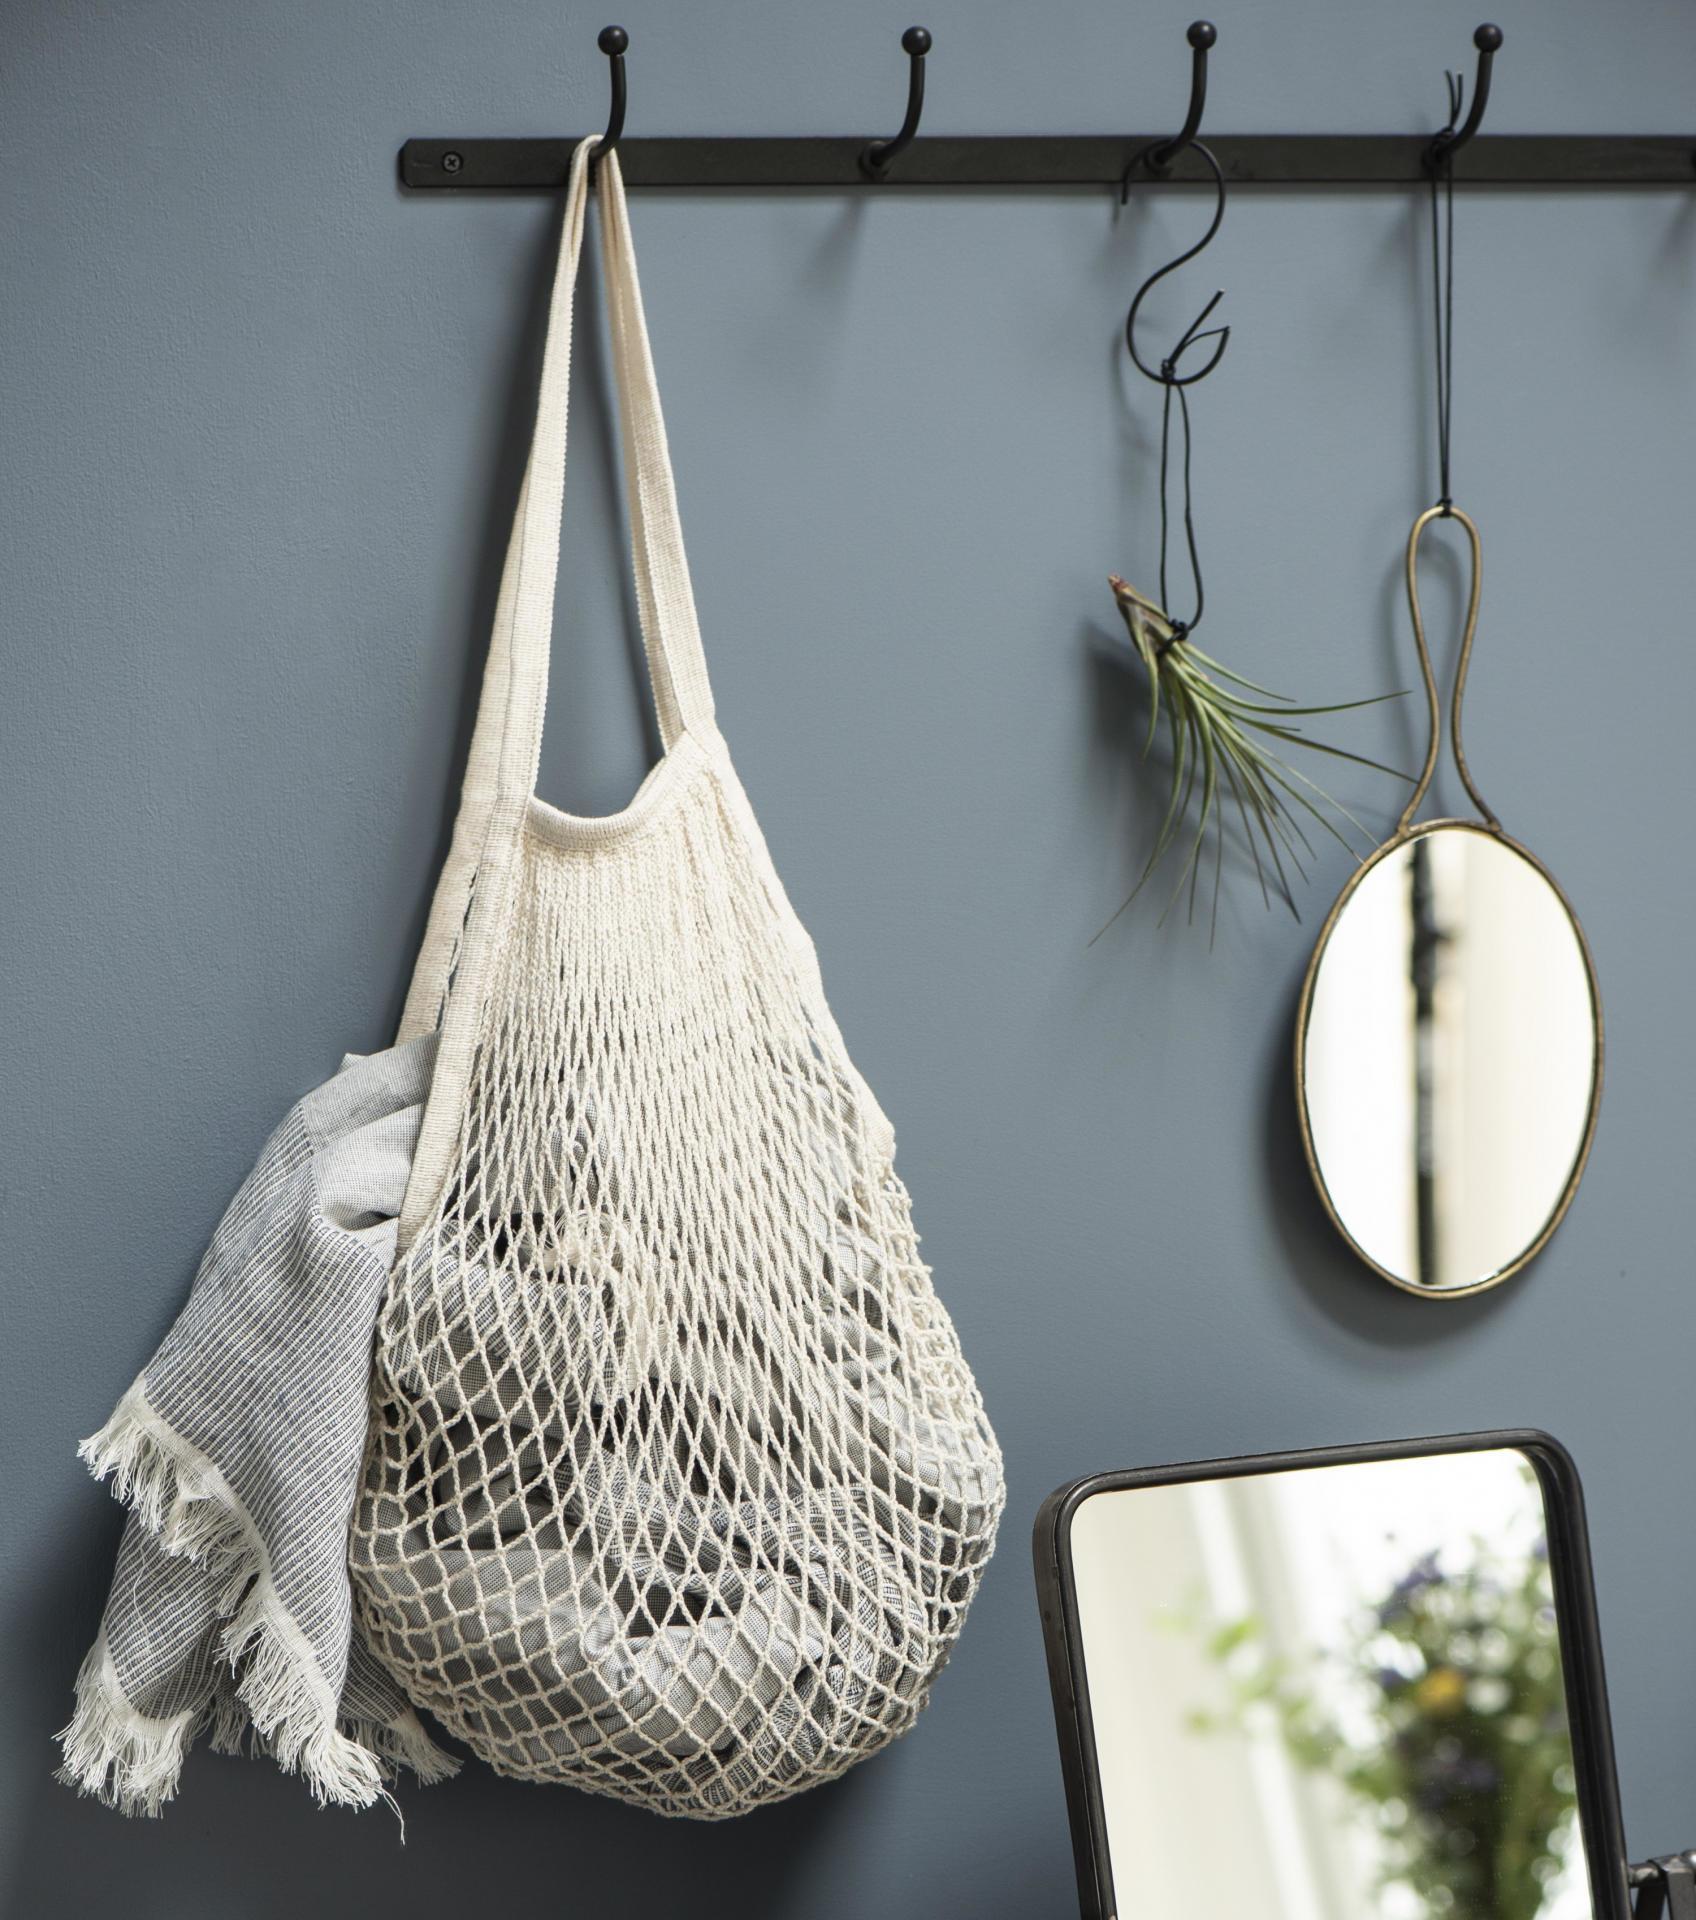 IB LAURSEN Nákupní taška síťovka 4 barvy Růžová, růžová barva, modrá barva, šedá barva, bílá barva, textil